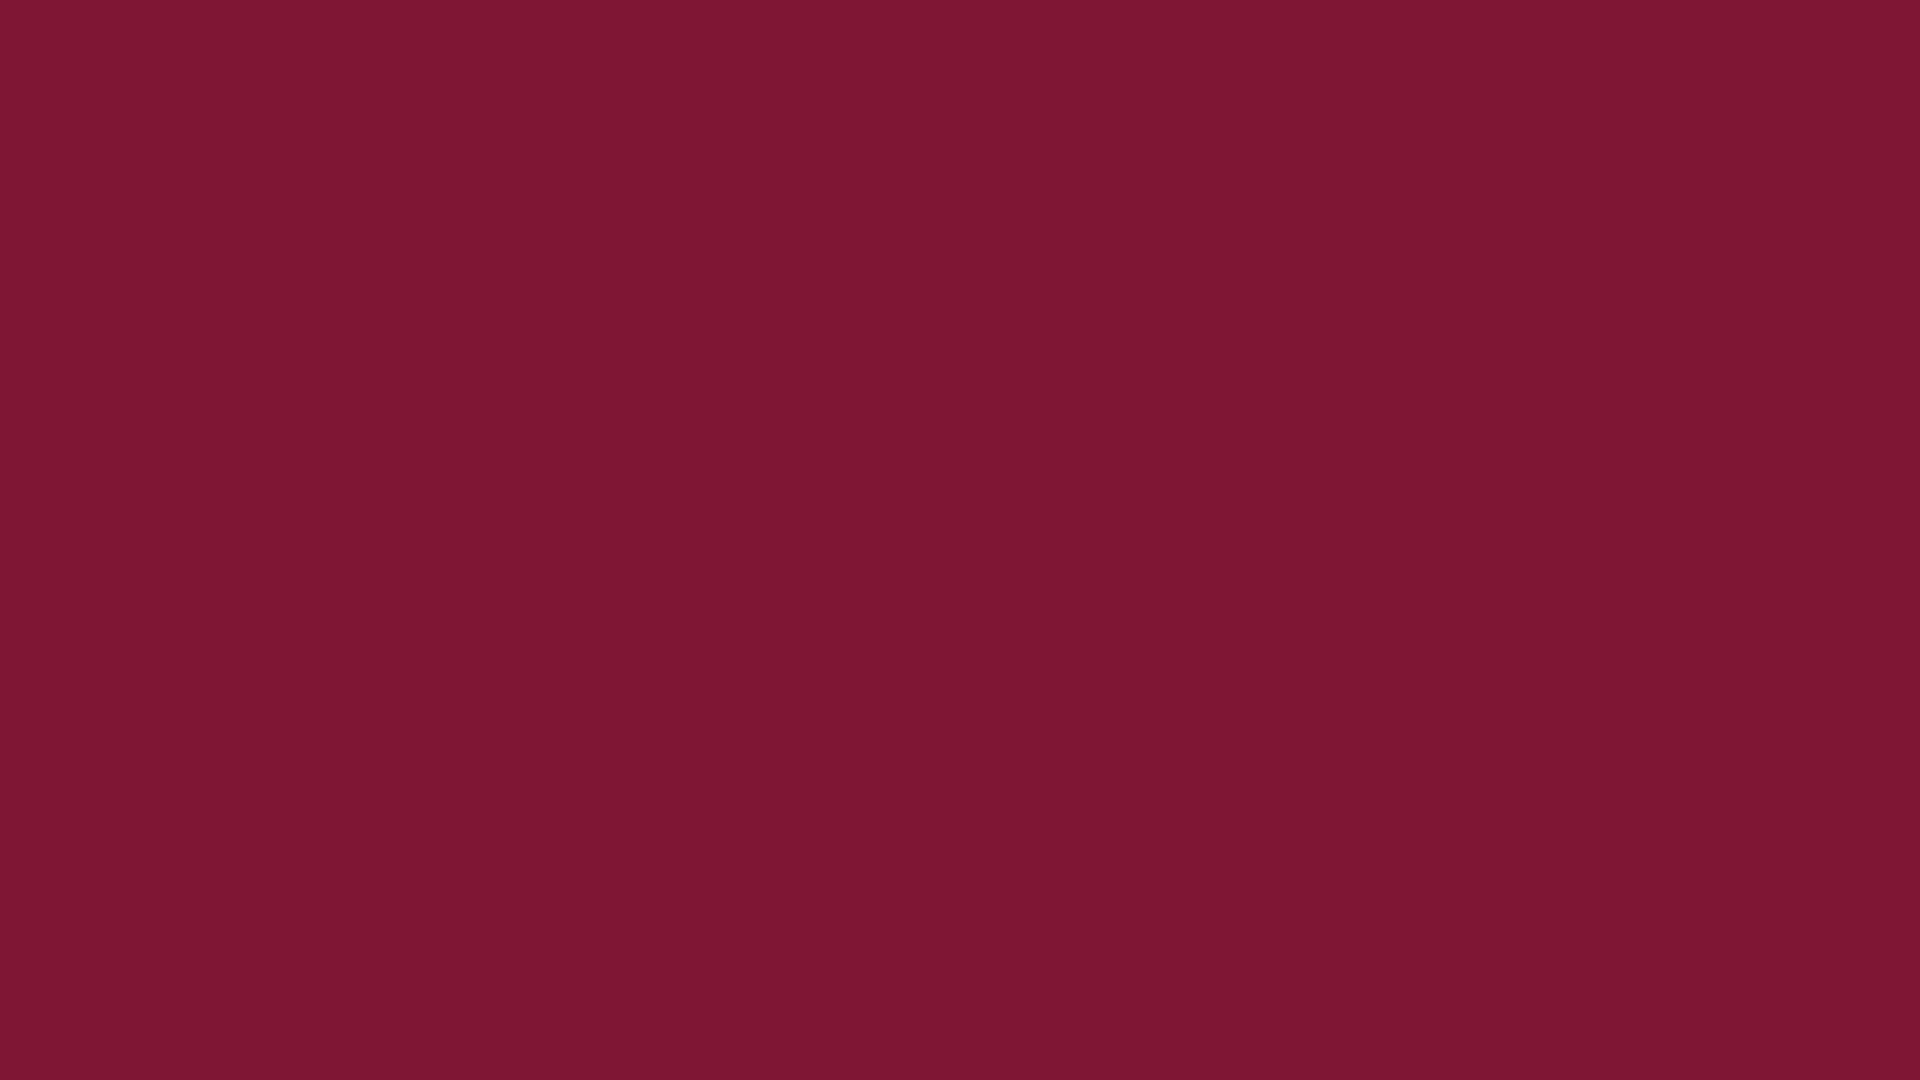 1920x1080 Claret Solid Color Background